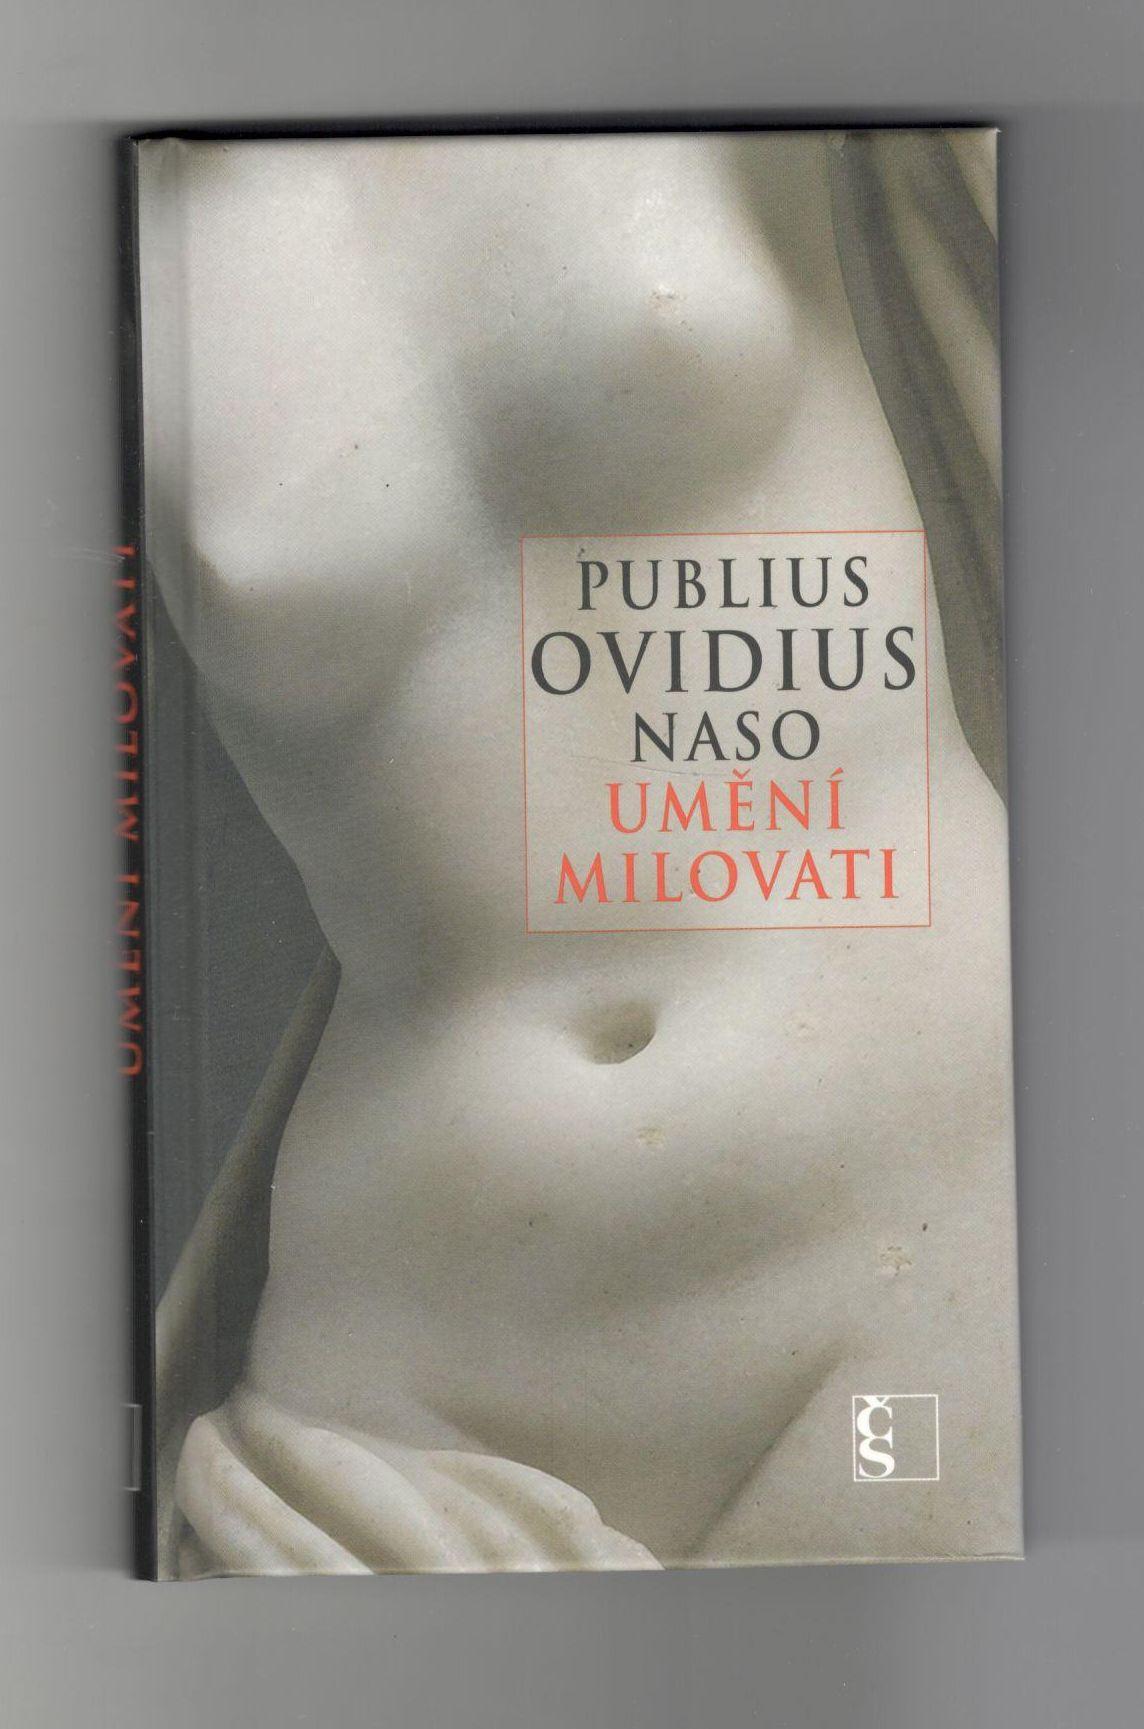 Umění milovat - Publius Ovidius Naso